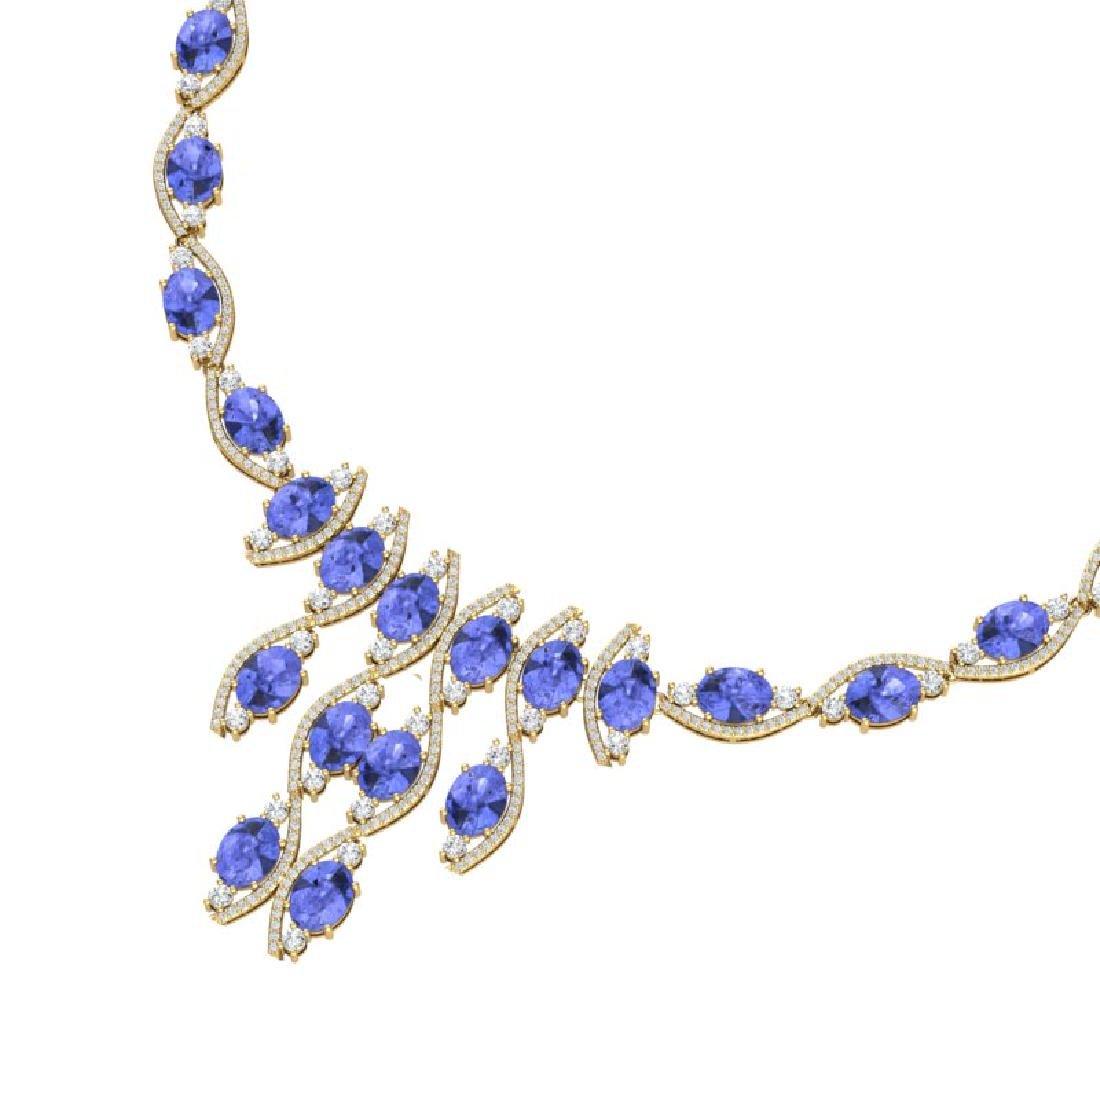 65.60 CTW Royalty Tanzanite & VS Diamond Necklace 18K